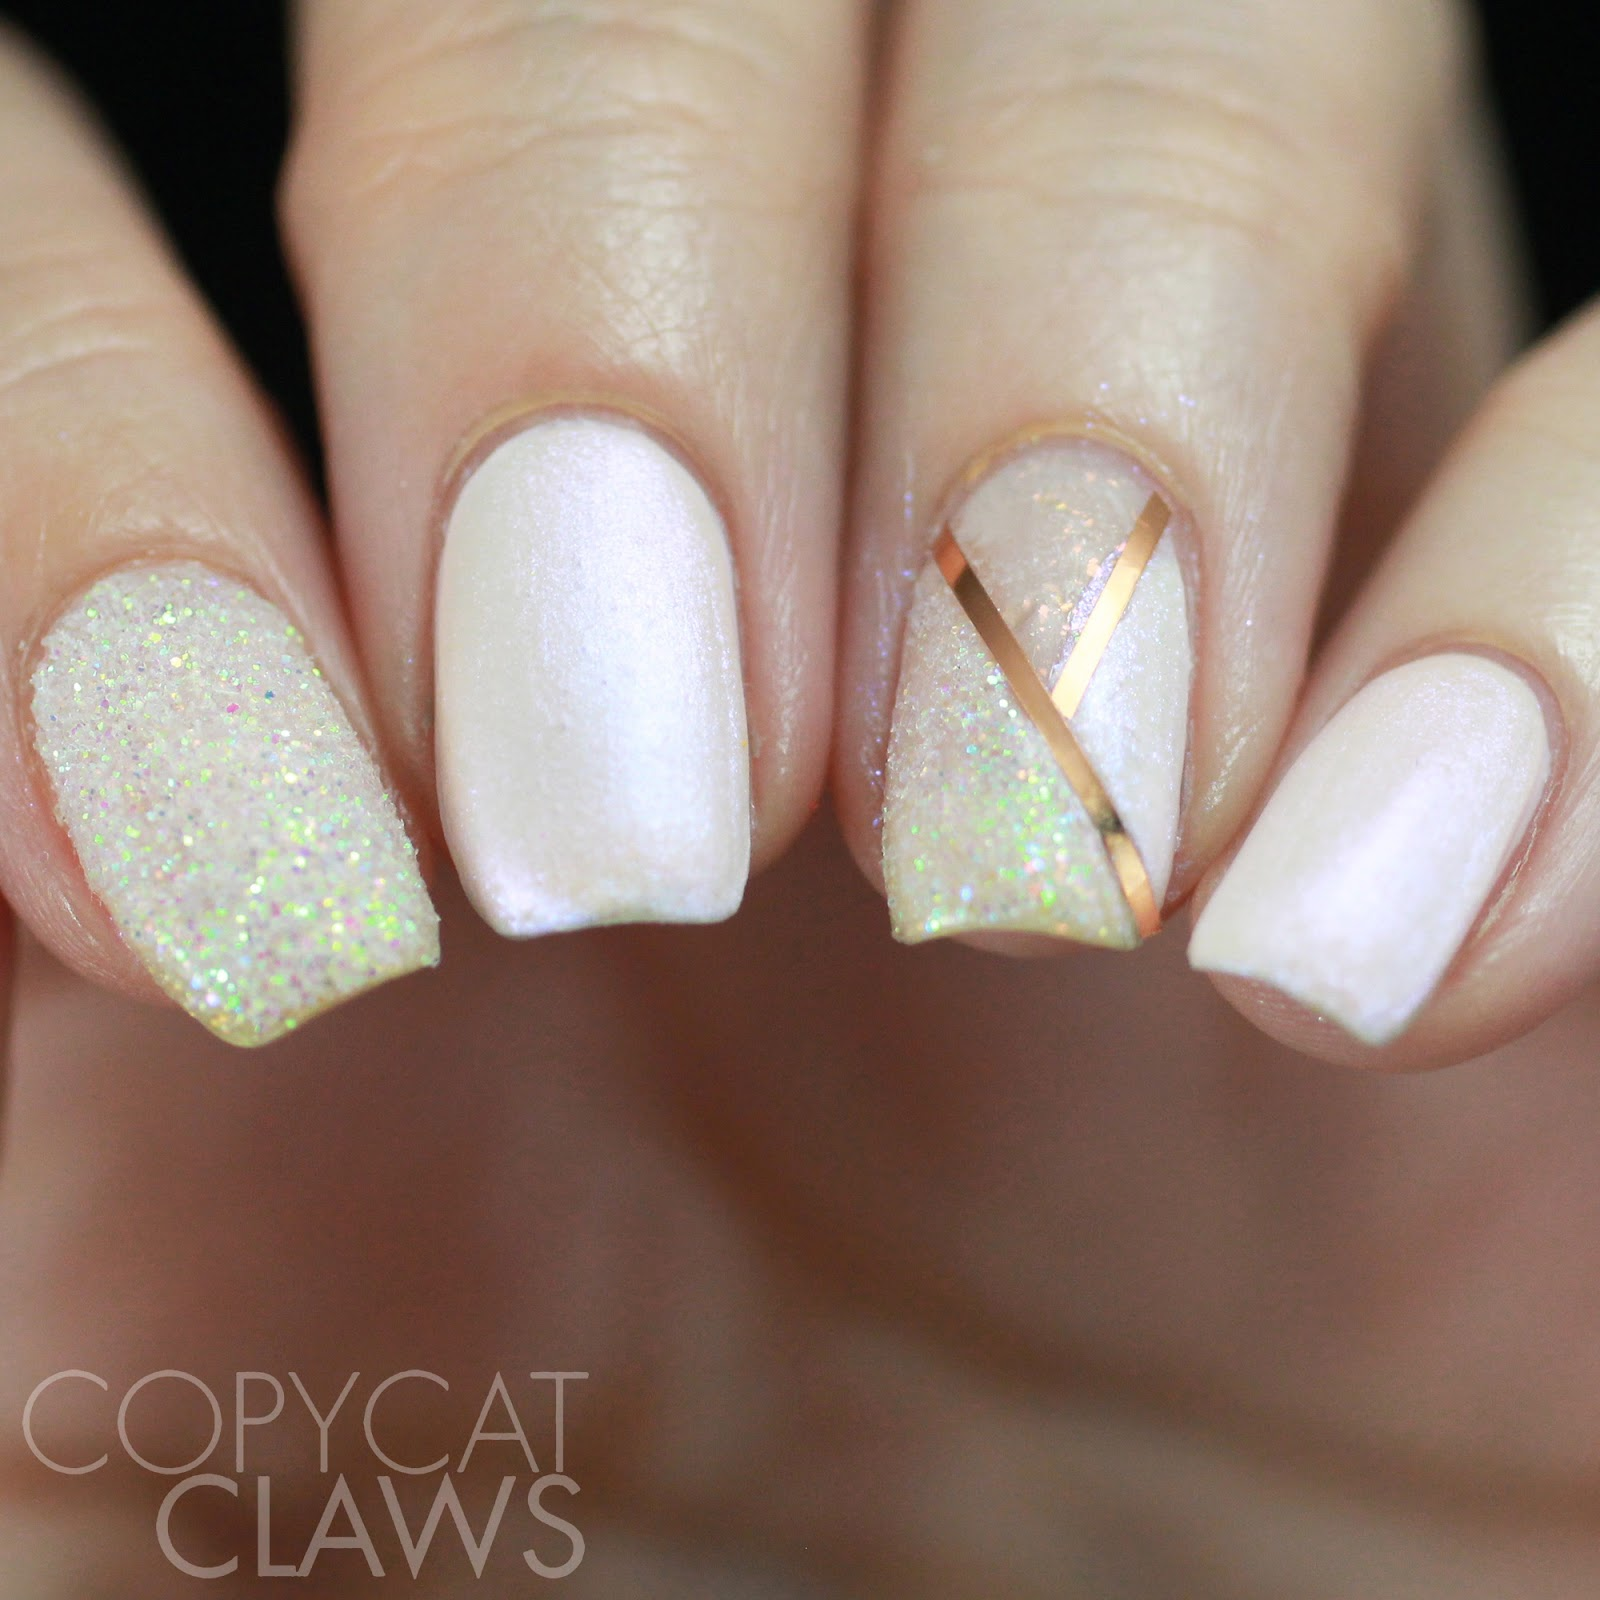 Copycat Claws 26 Great Nail Art Ideas Wedding